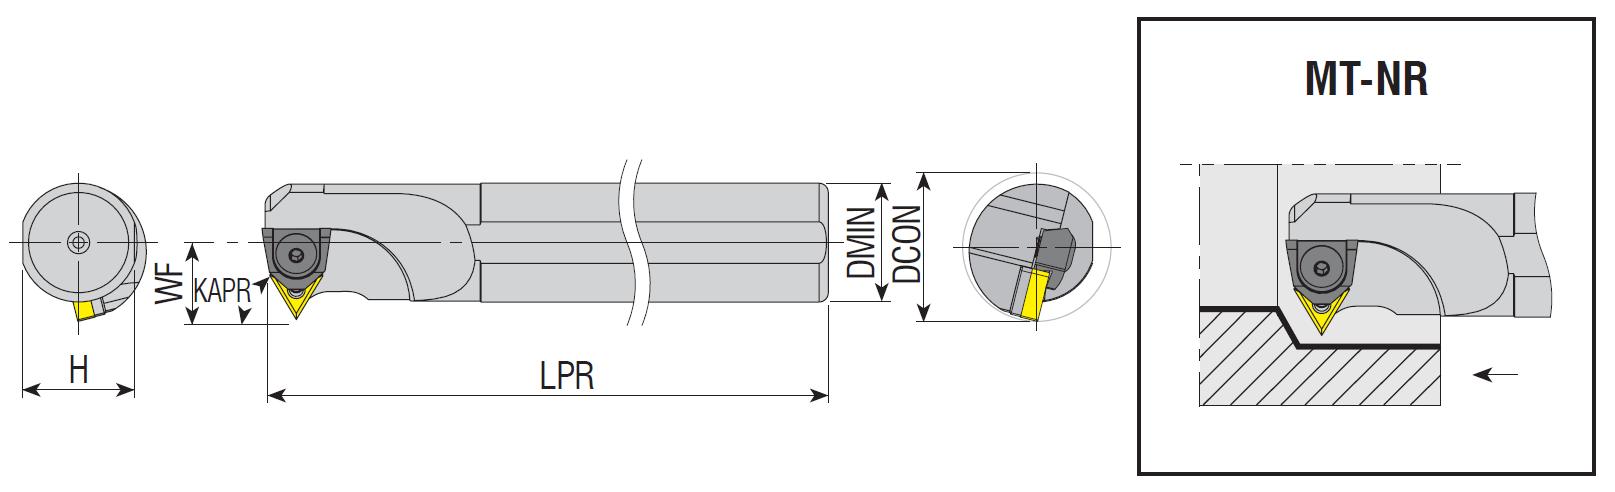 Bohrstangen MT-NR / MT-NL